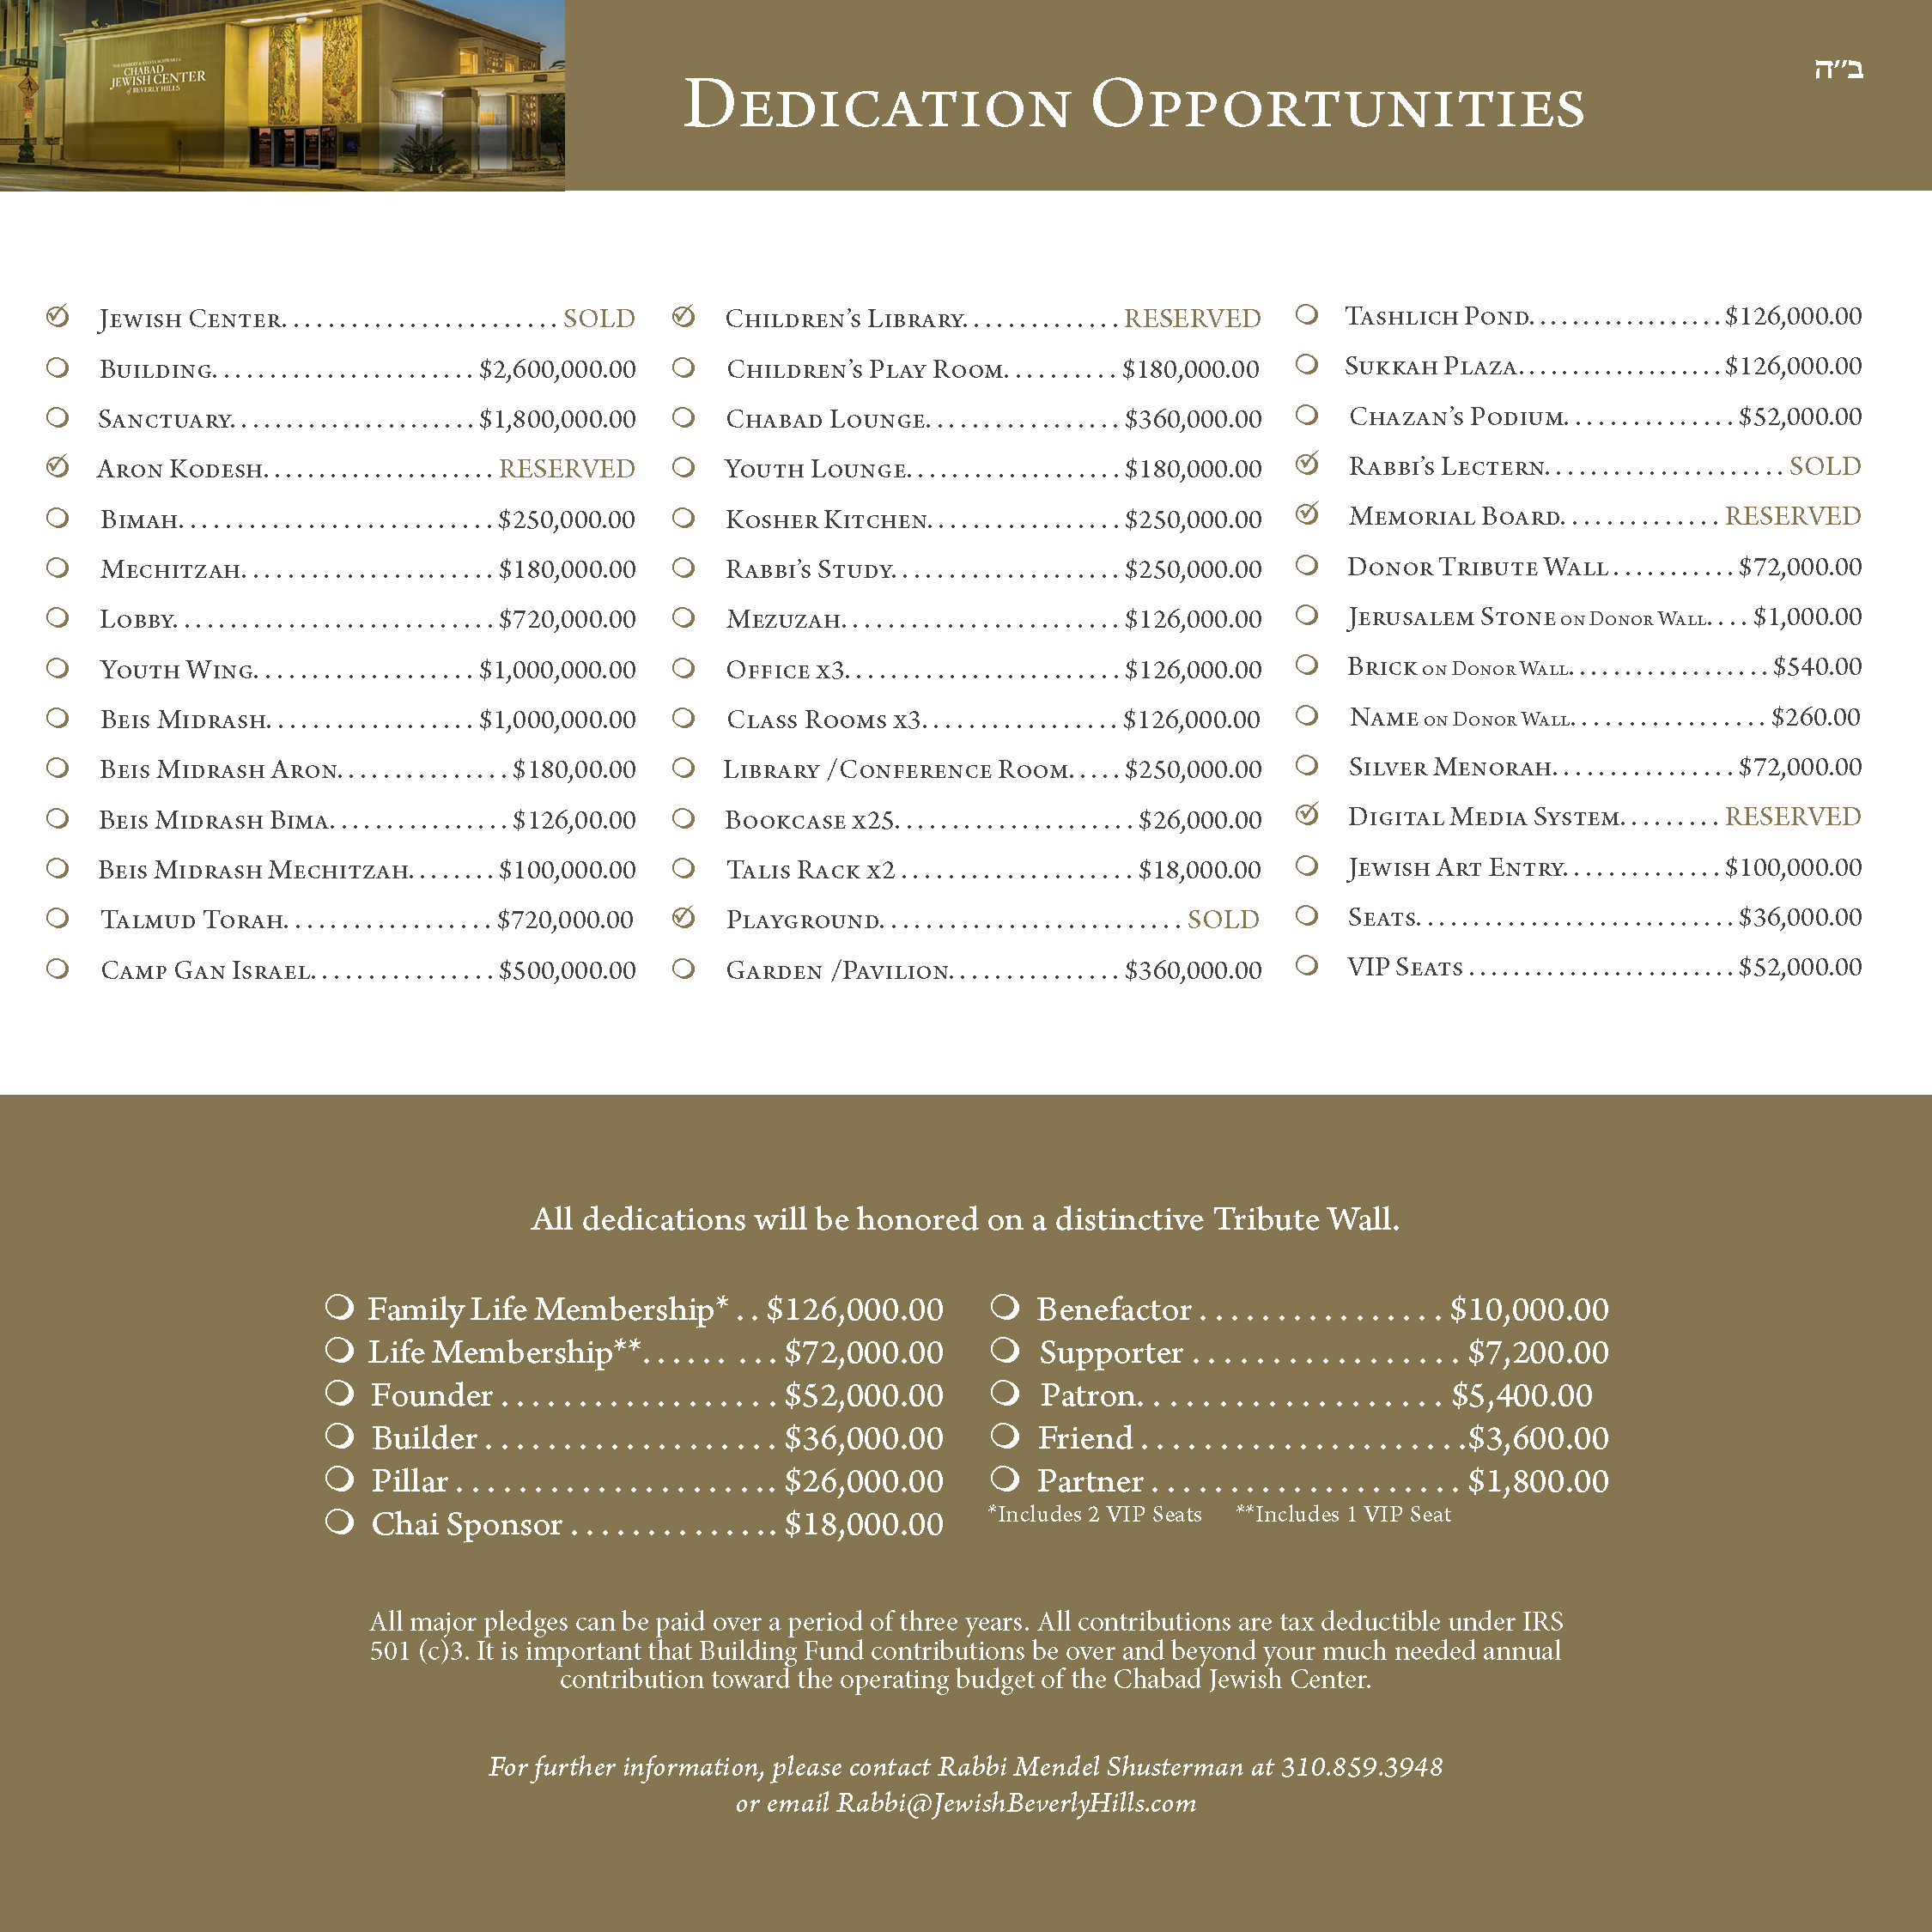 Dedication Opps 2020 website.png